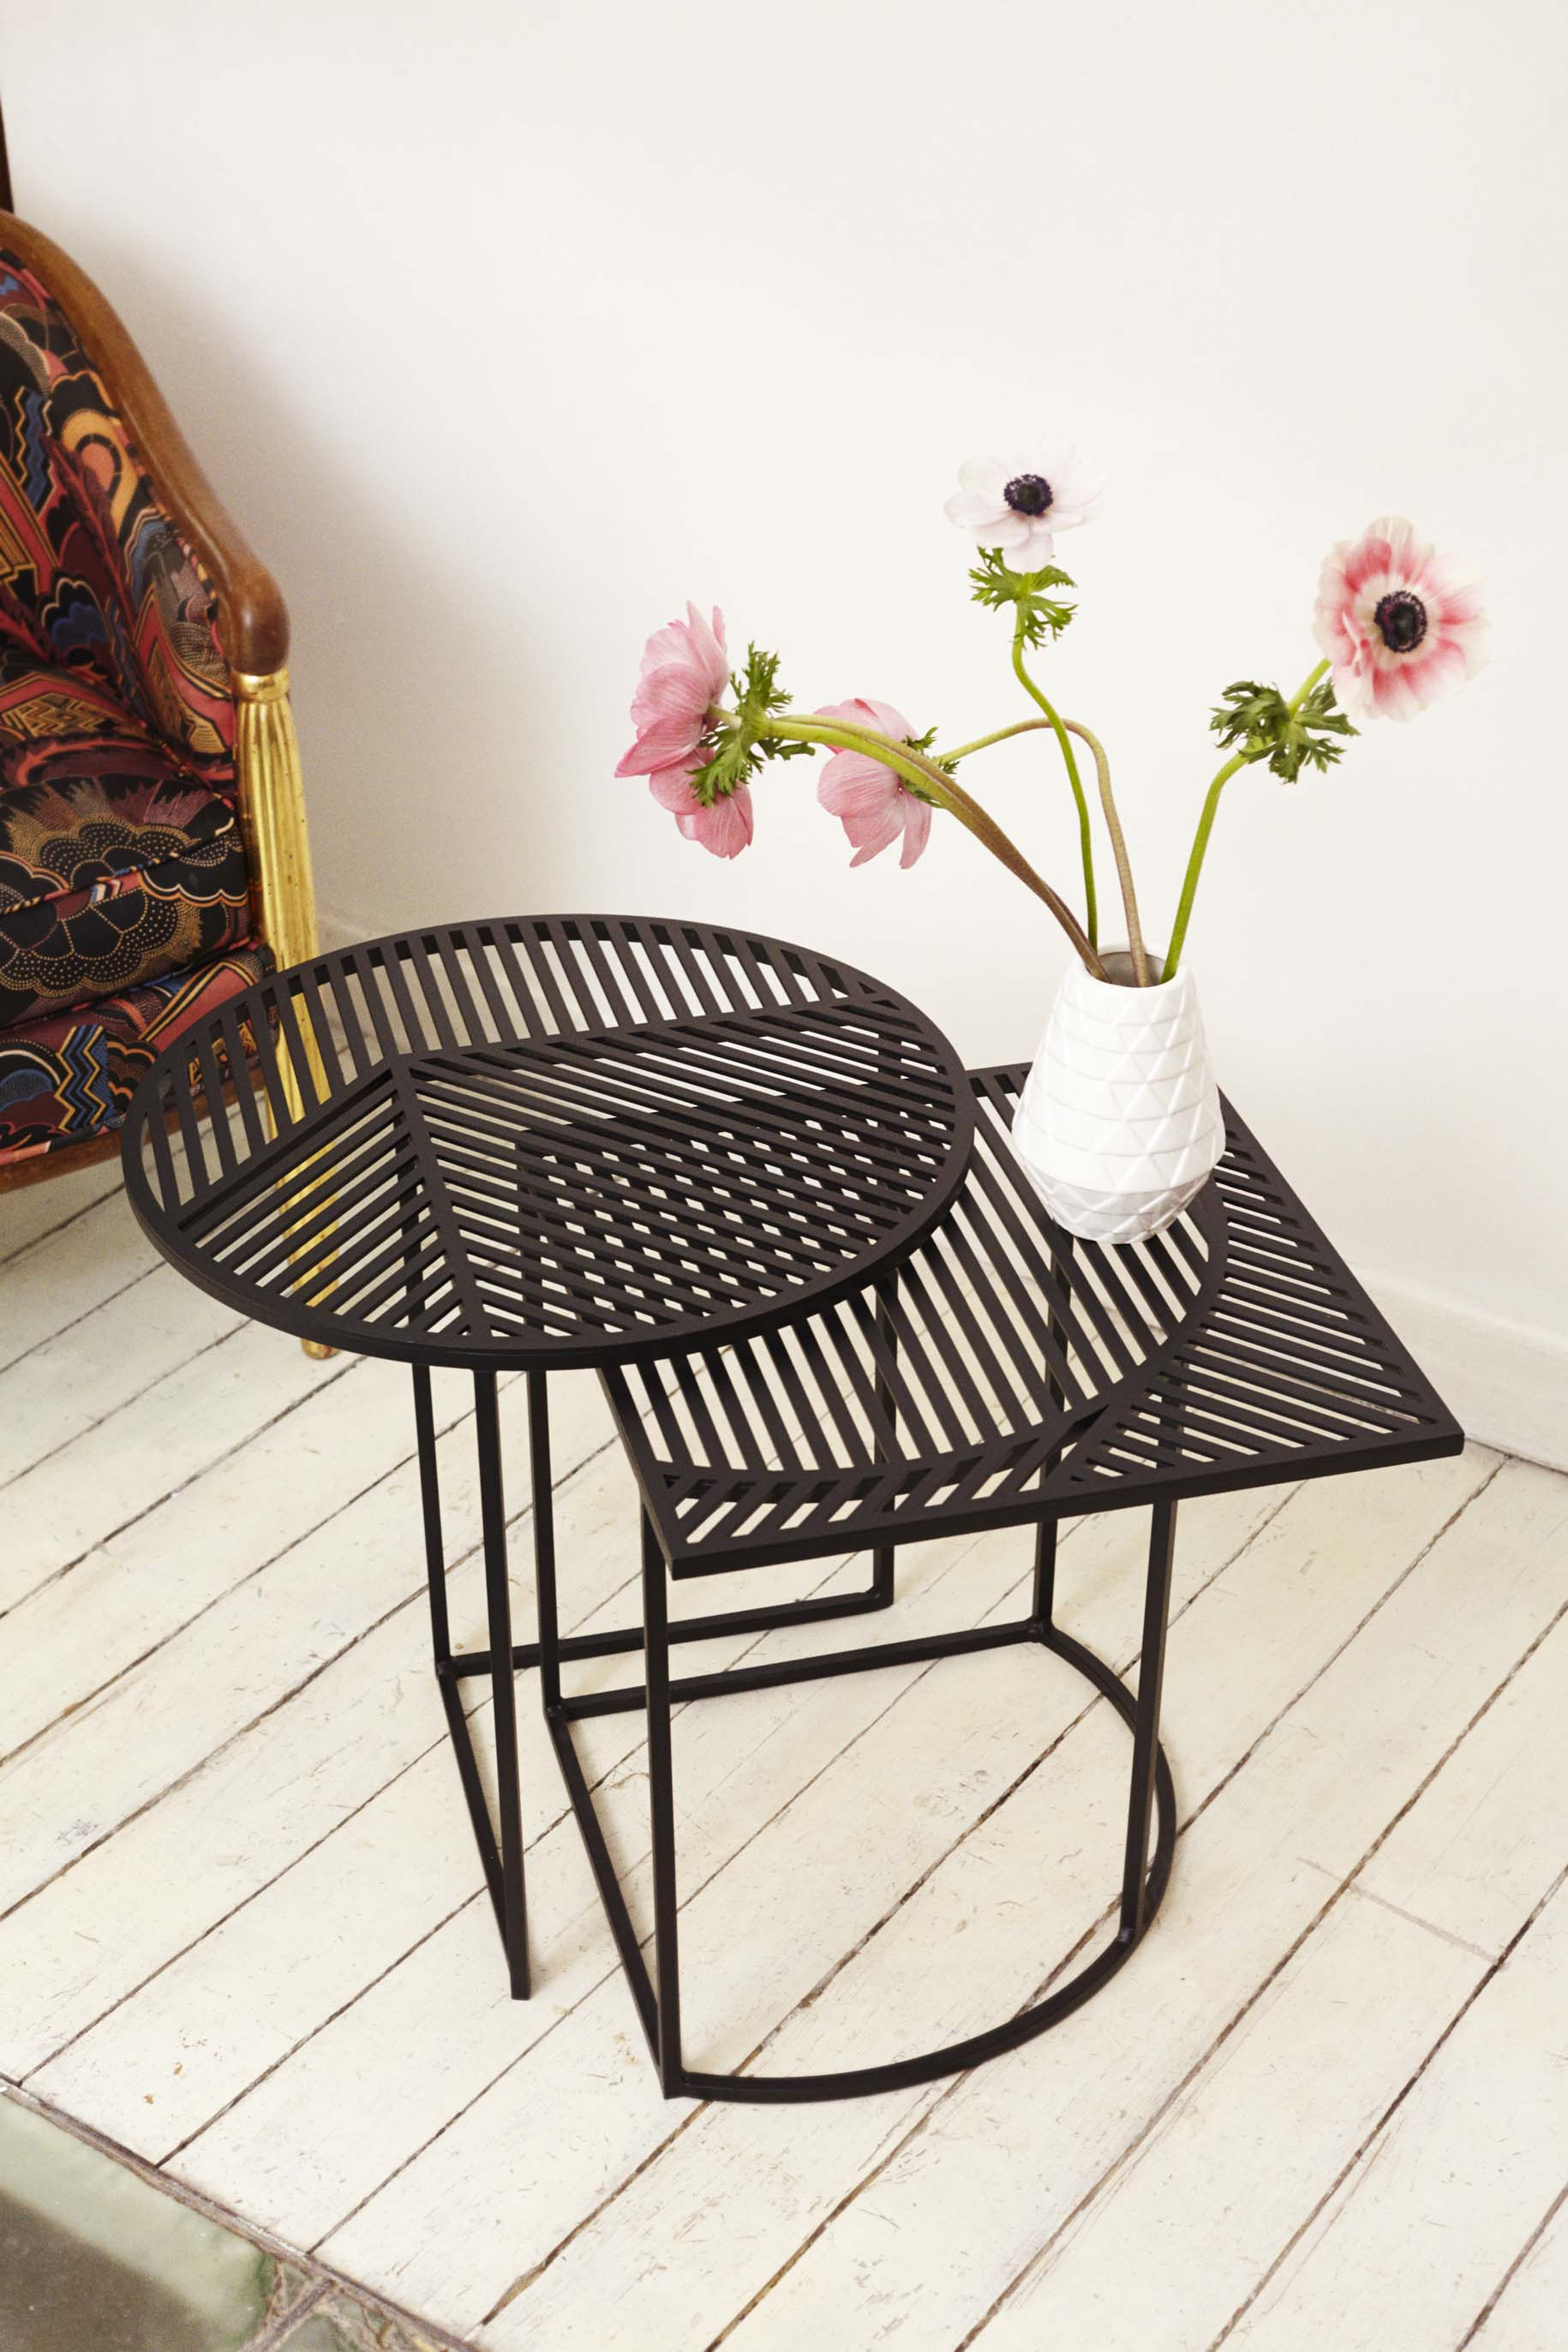 petite friture design esperluette. Black Bedroom Furniture Sets. Home Design Ideas